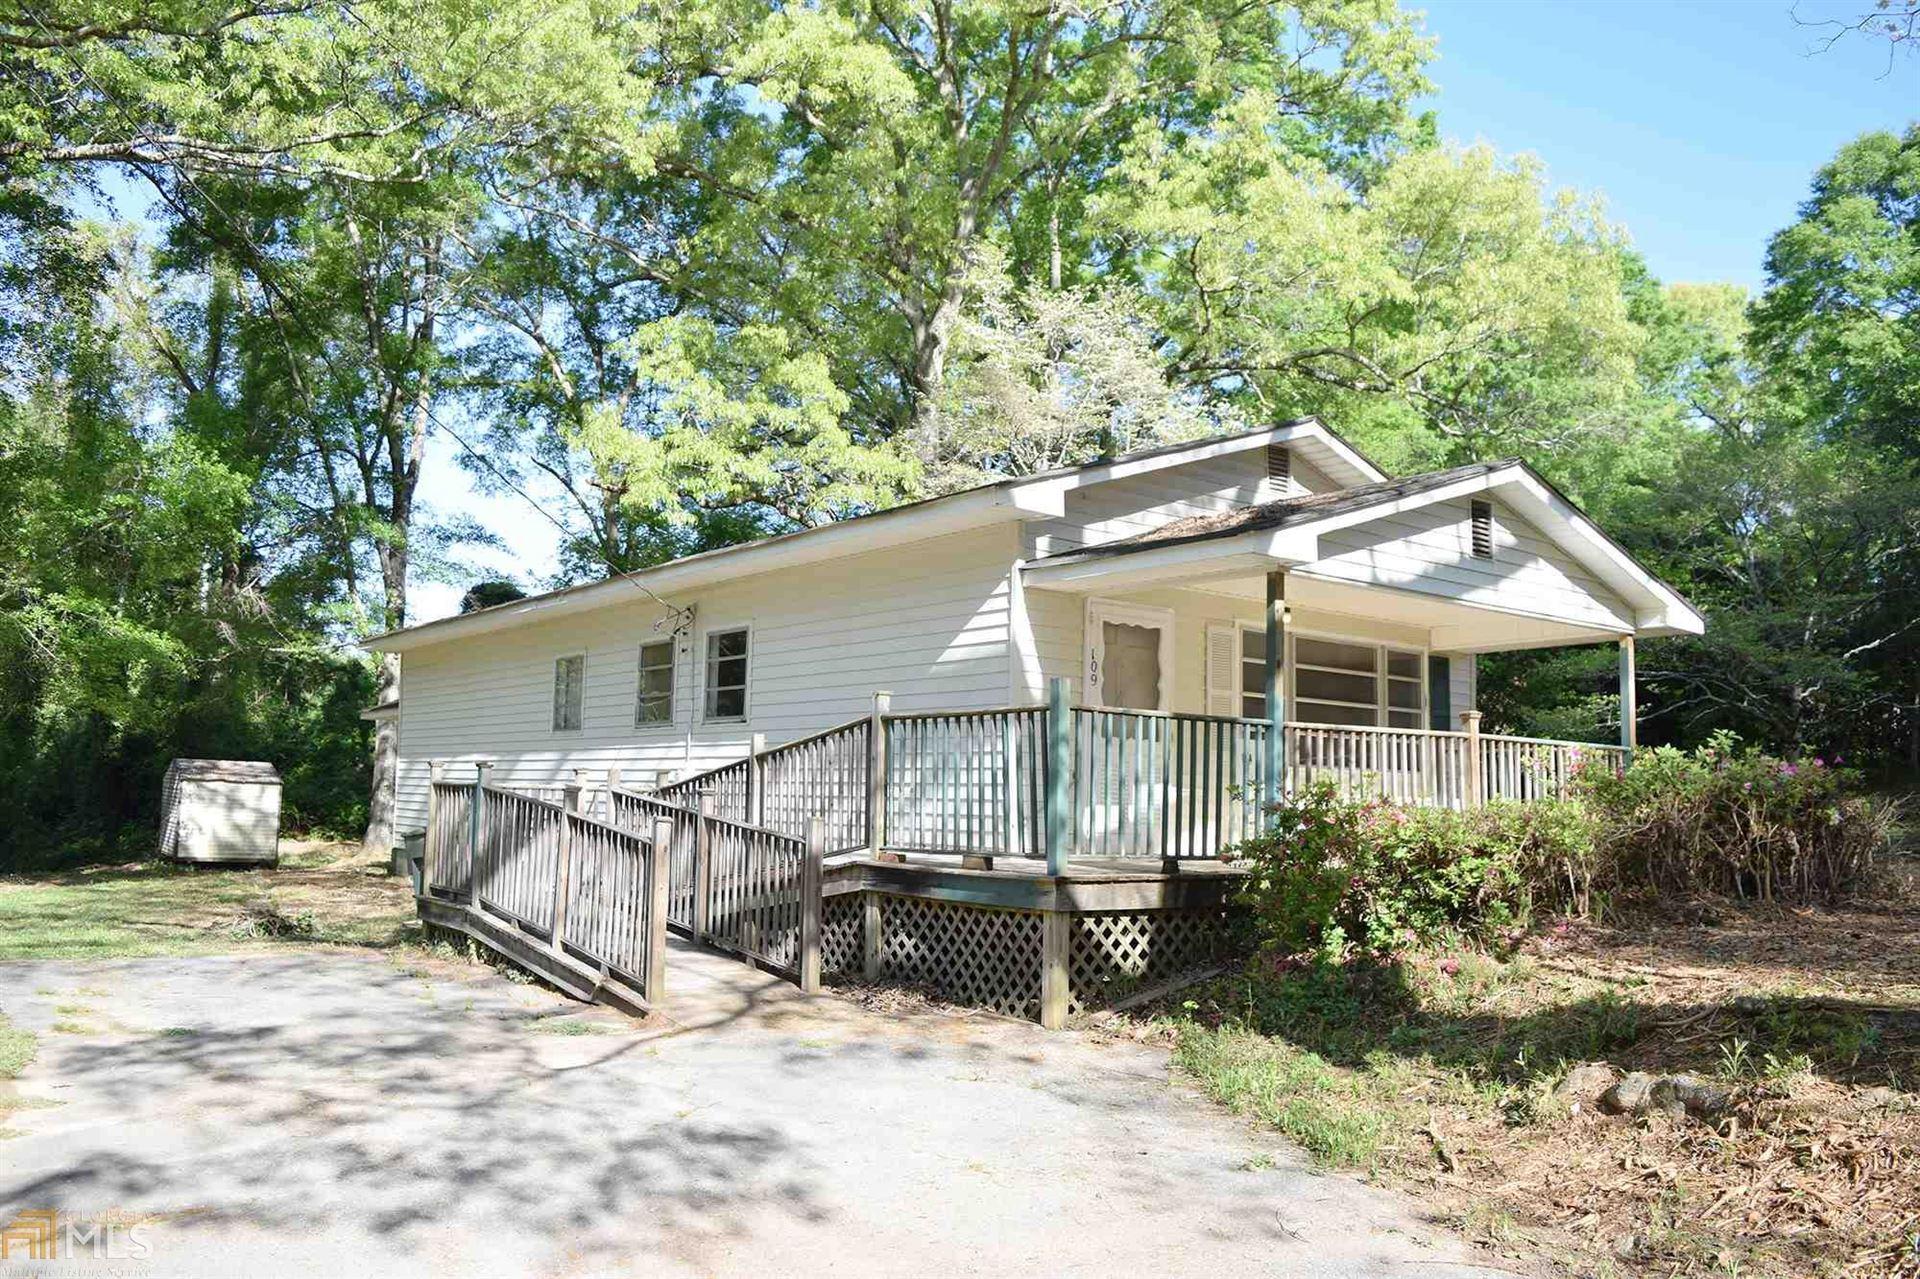 109 Maple Dr, Hogansville, GA 30230 - #: 8960638